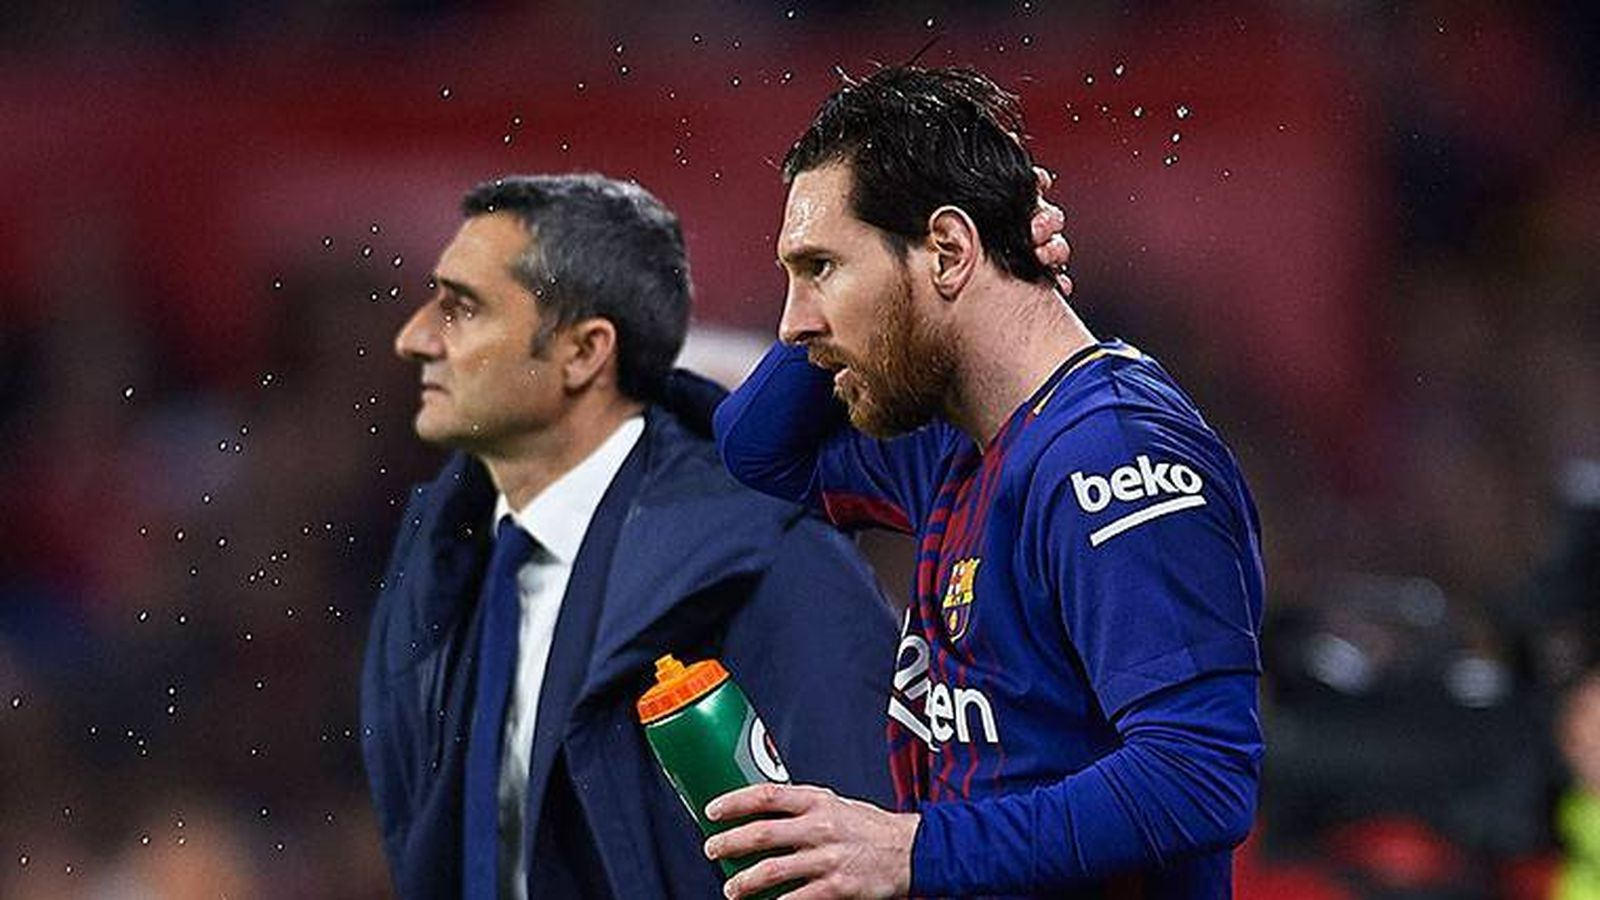 Foto: Valverde, junto a Messi, en la banda del Camp Nou. (EFE)